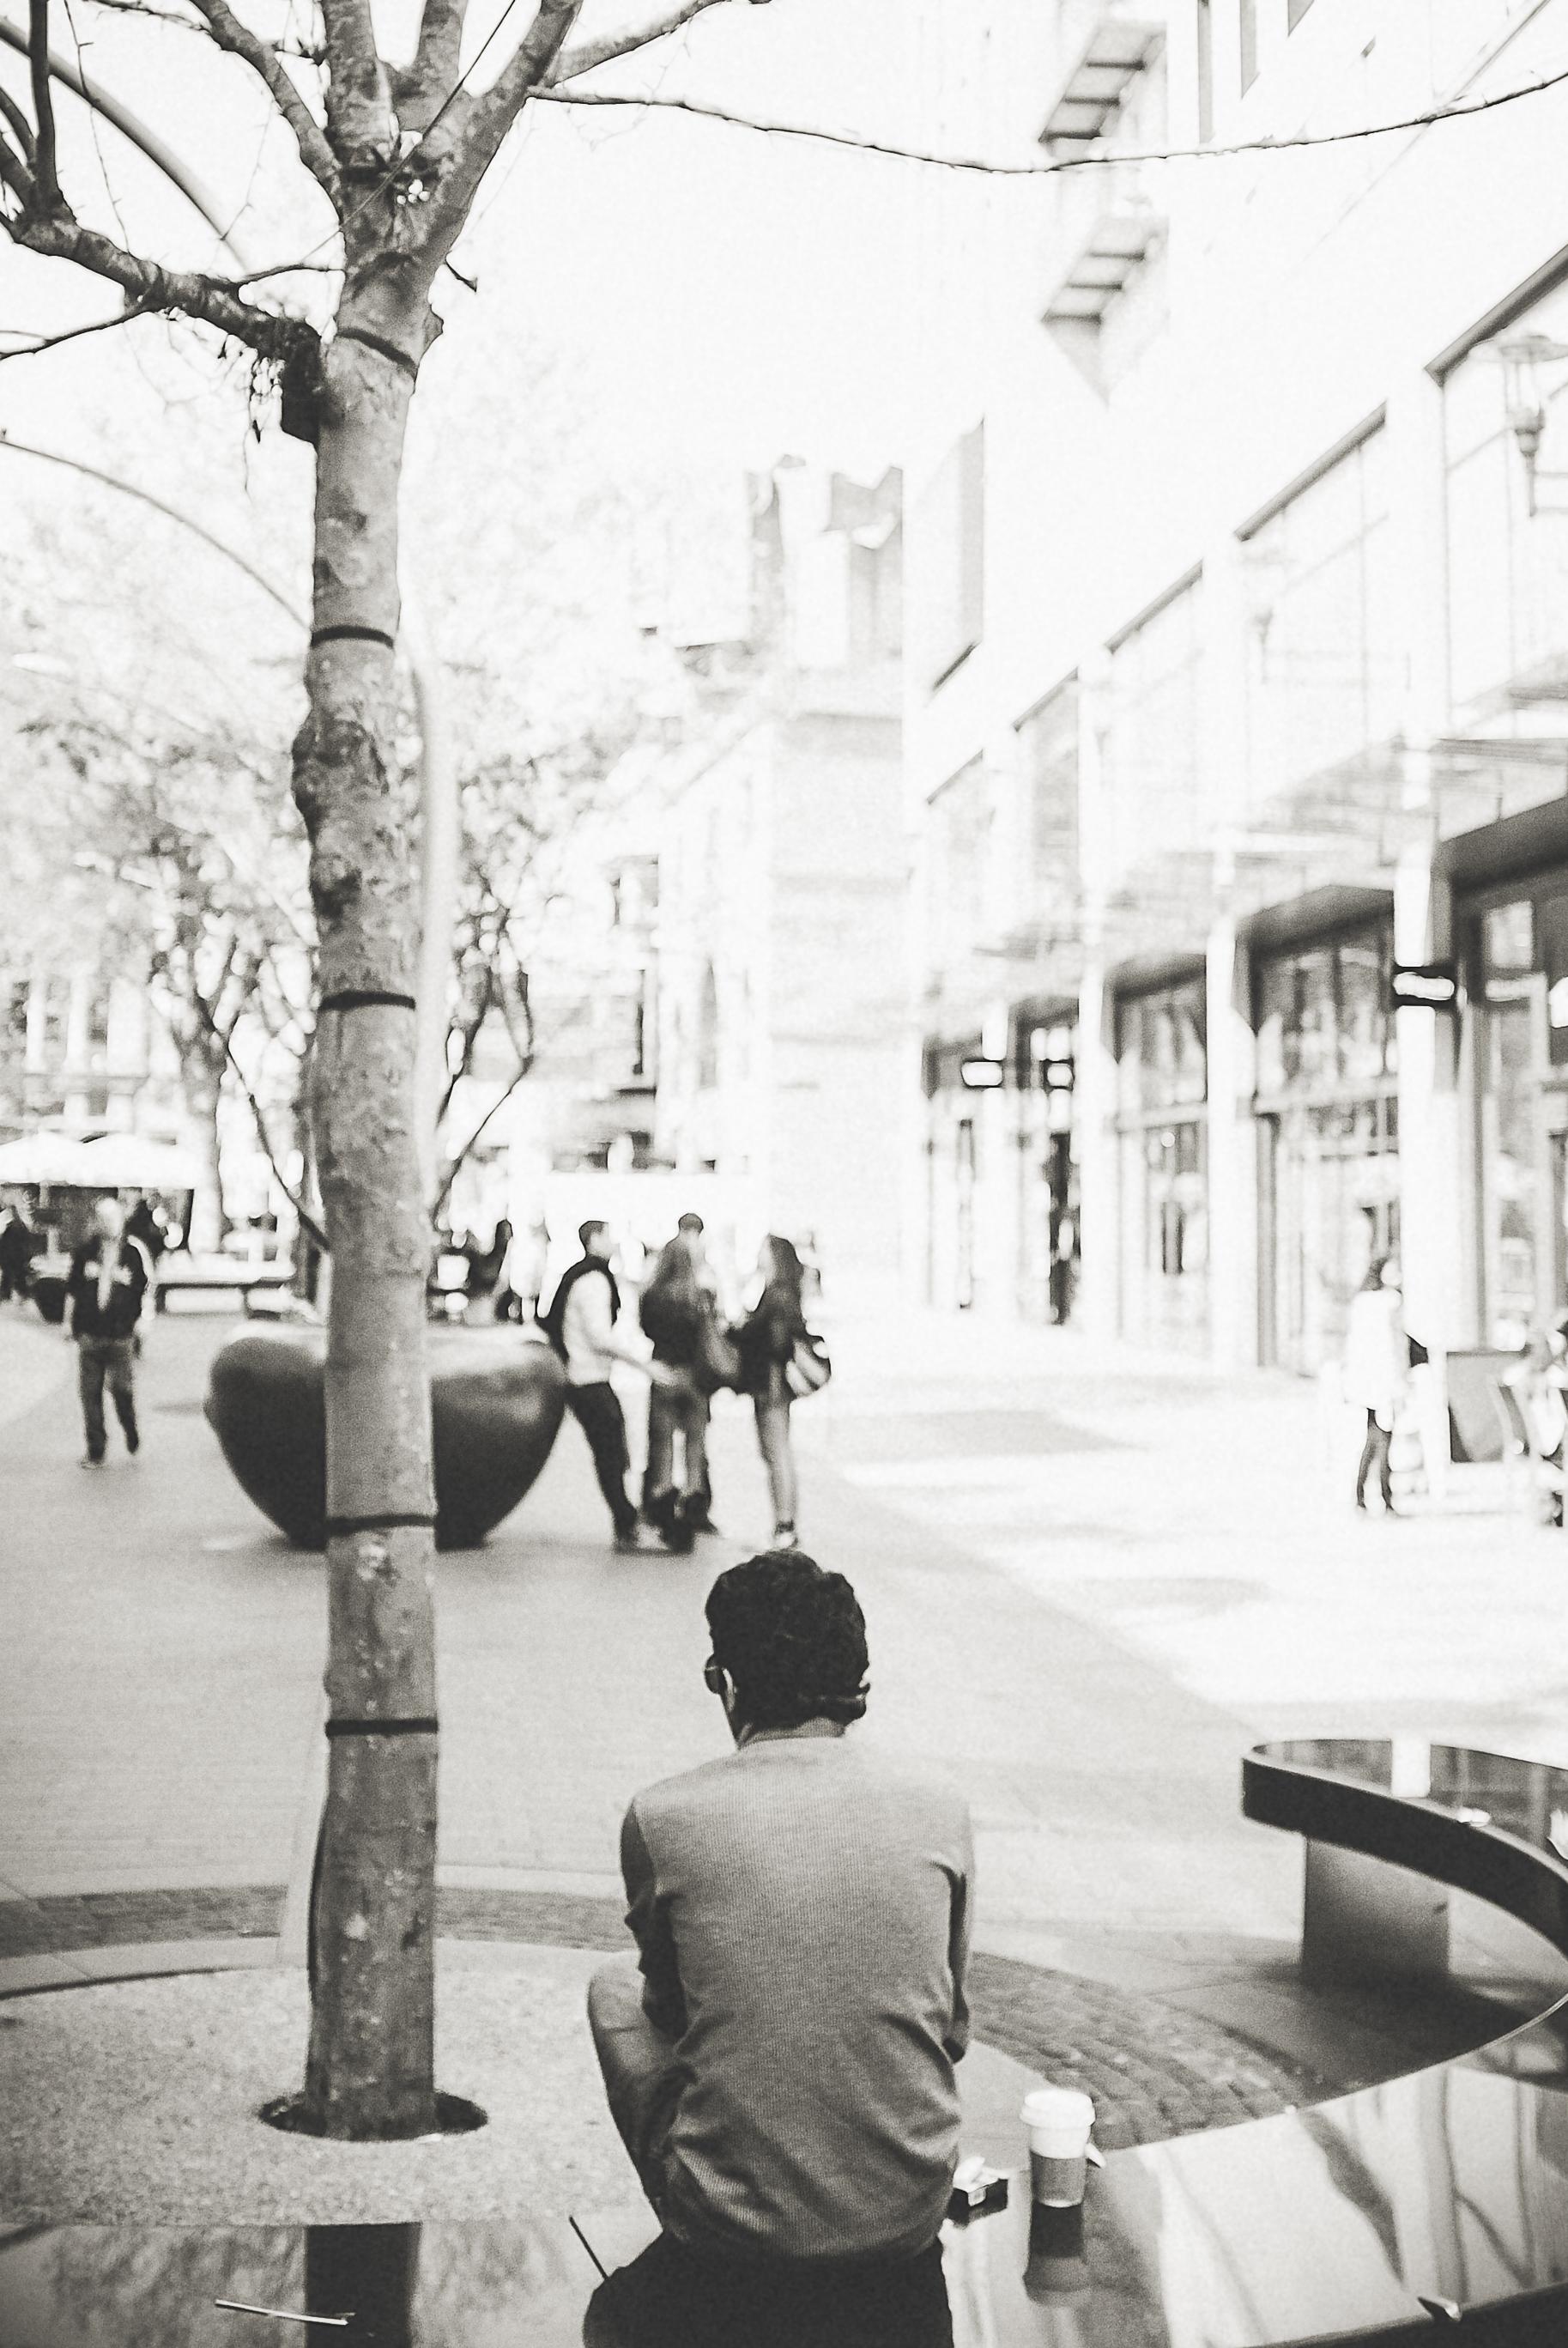 cardiff_street_photography_with_the_fuji_x100-29.jpg